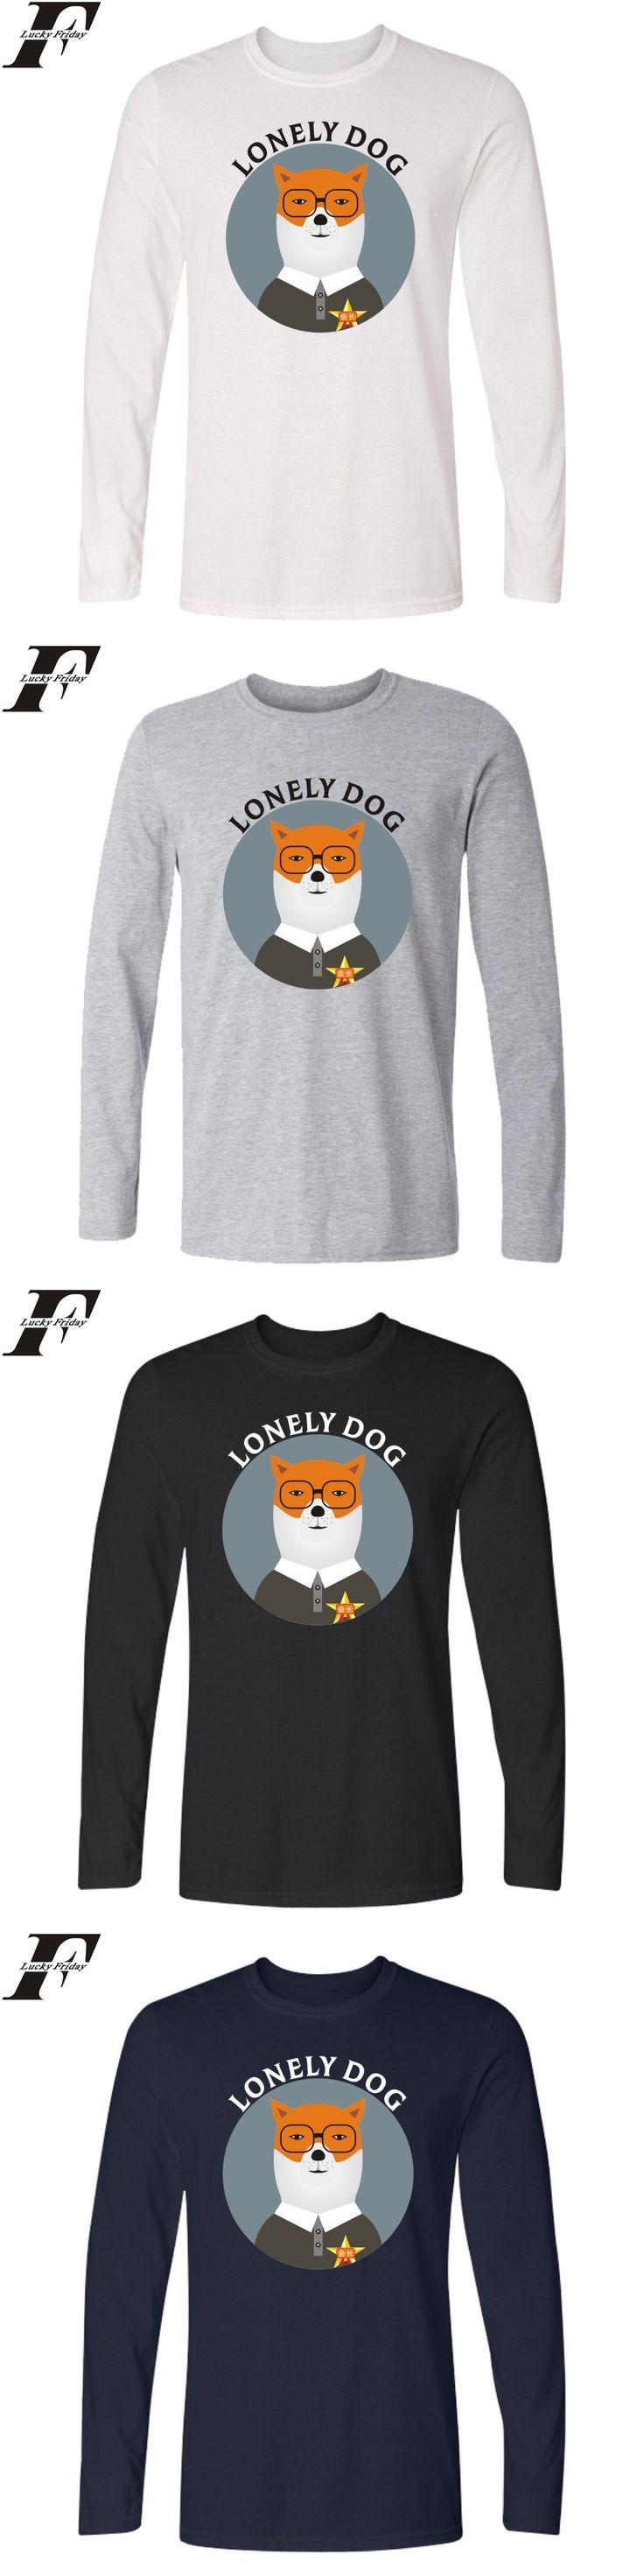 Spring Cotton camiseta masculina Funny t shirts Print T-shirt fitness Lovely Dog Creative long sleeve Tee Shirt men clothing 4xl